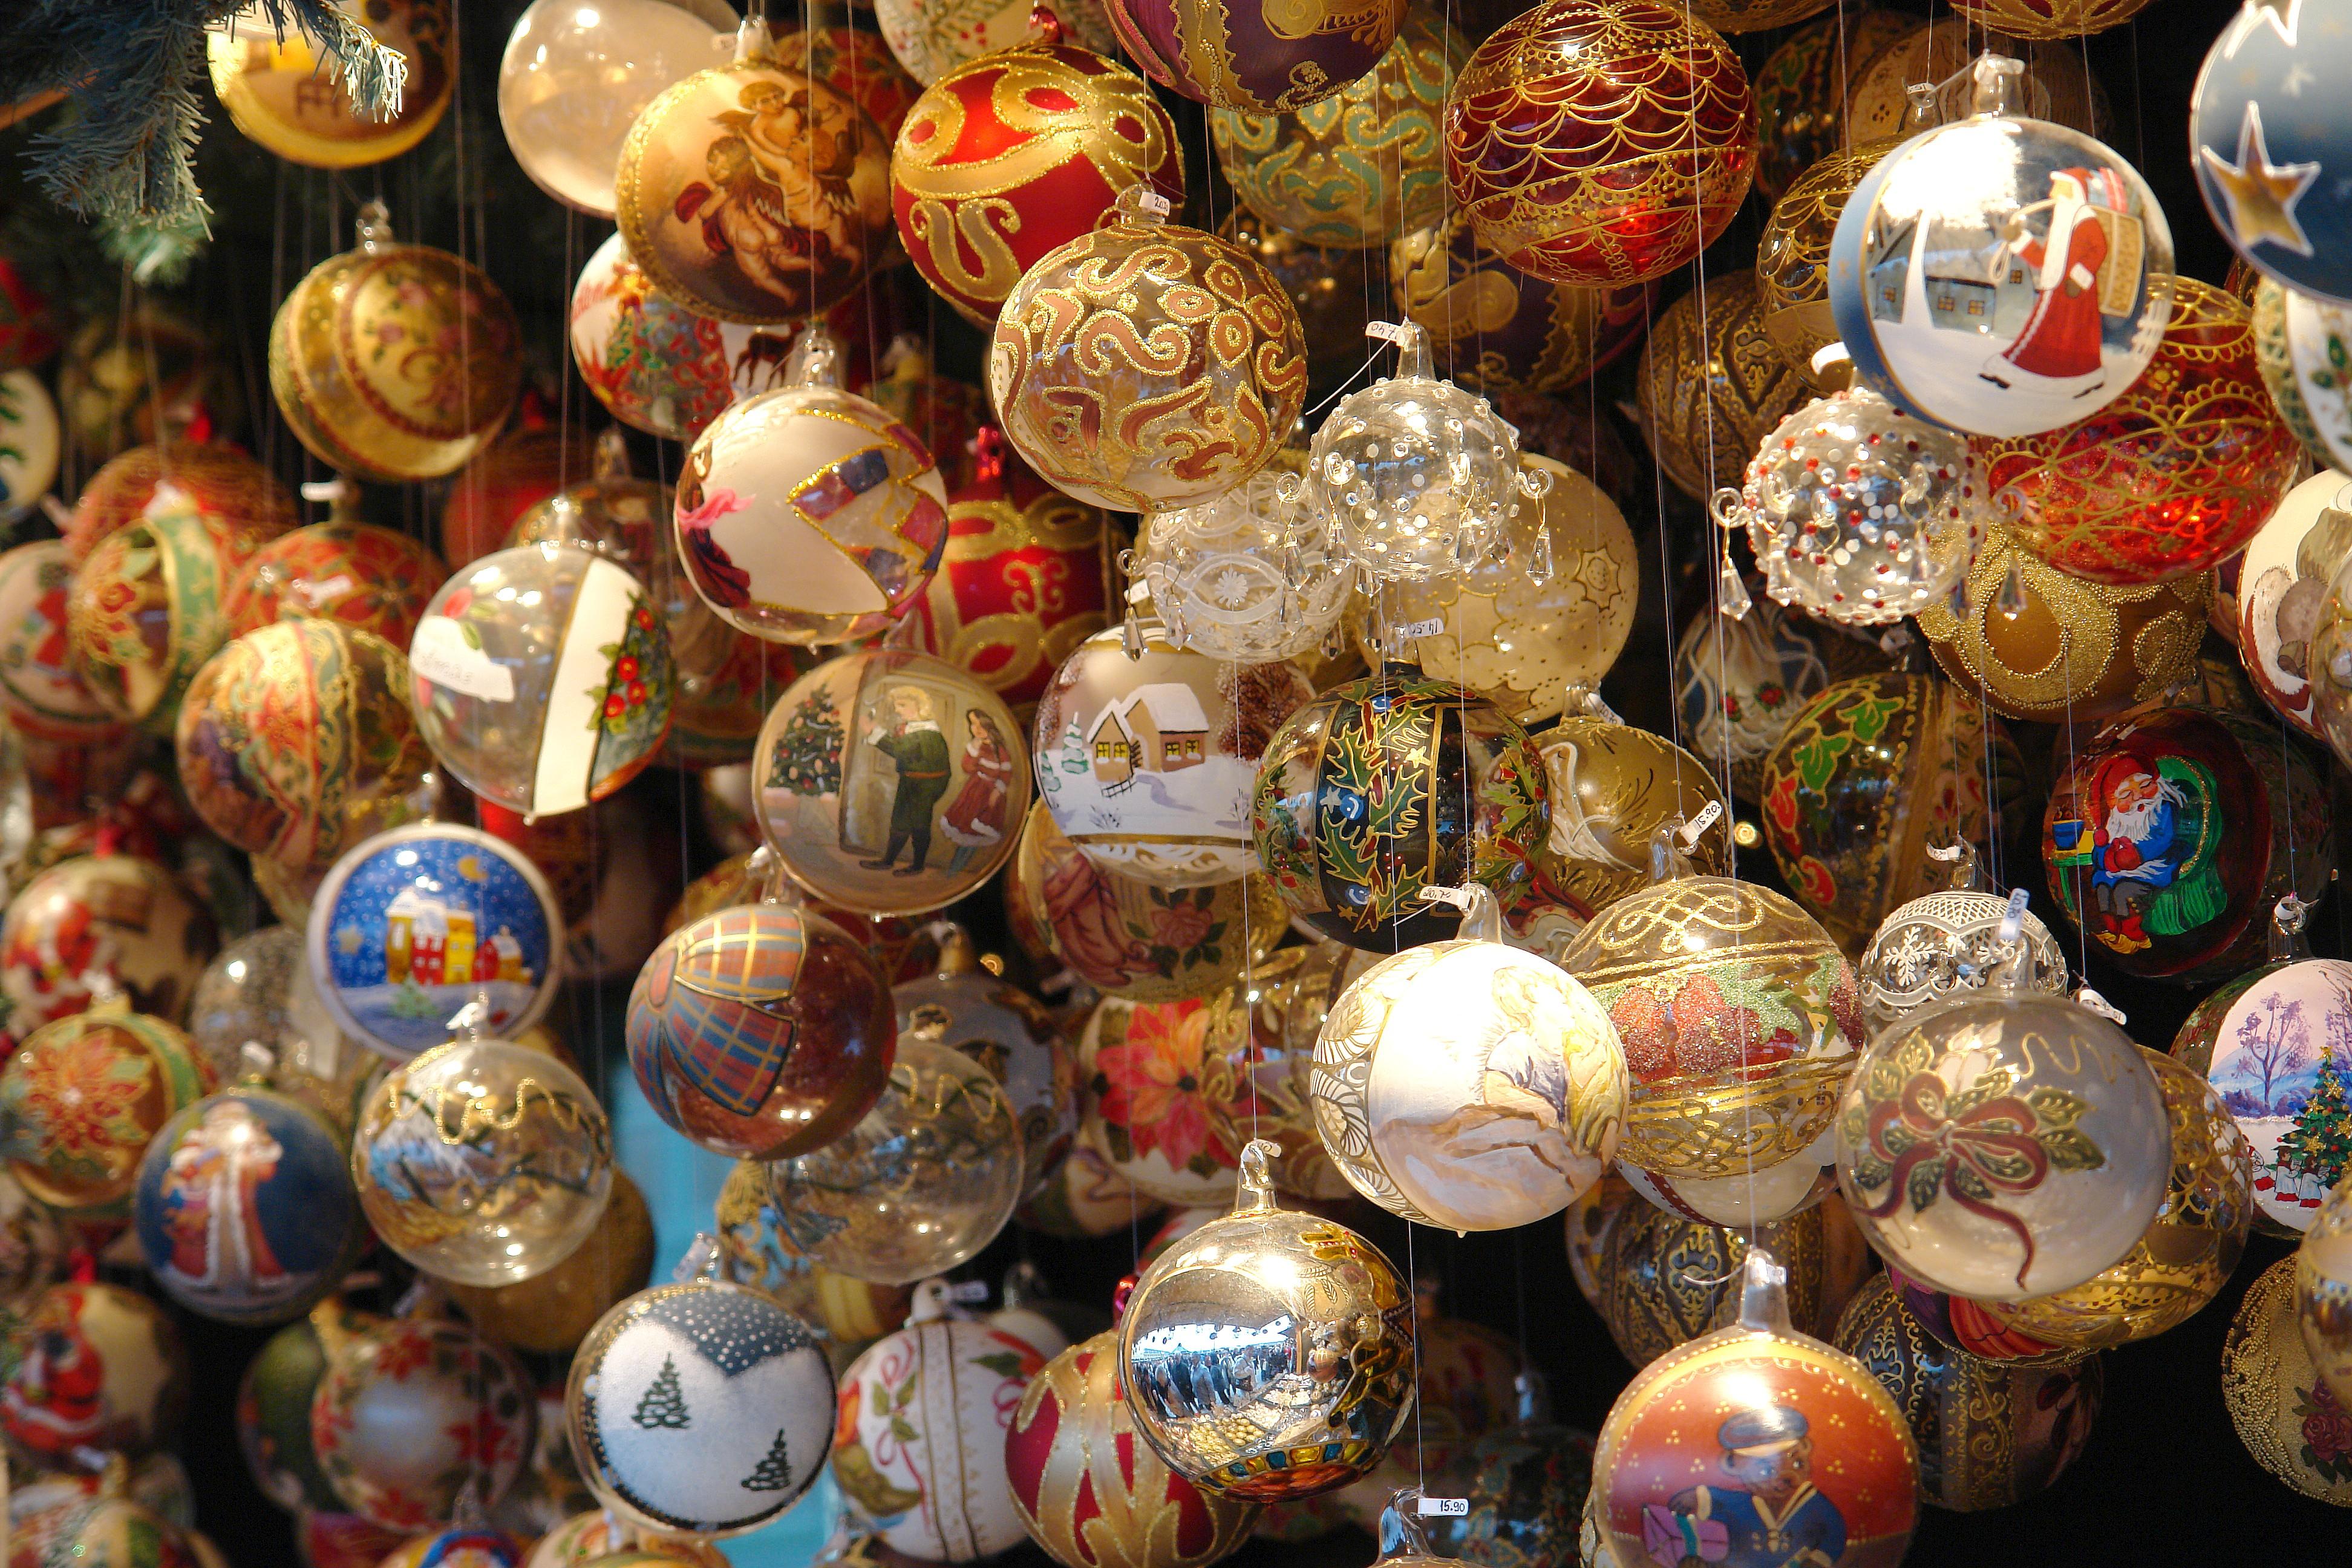 #B53216 Deck The Stalls: Christmas Markets Marchés De Noël  5545 decorations noel geneve 3888x2592 px @ aertt.com